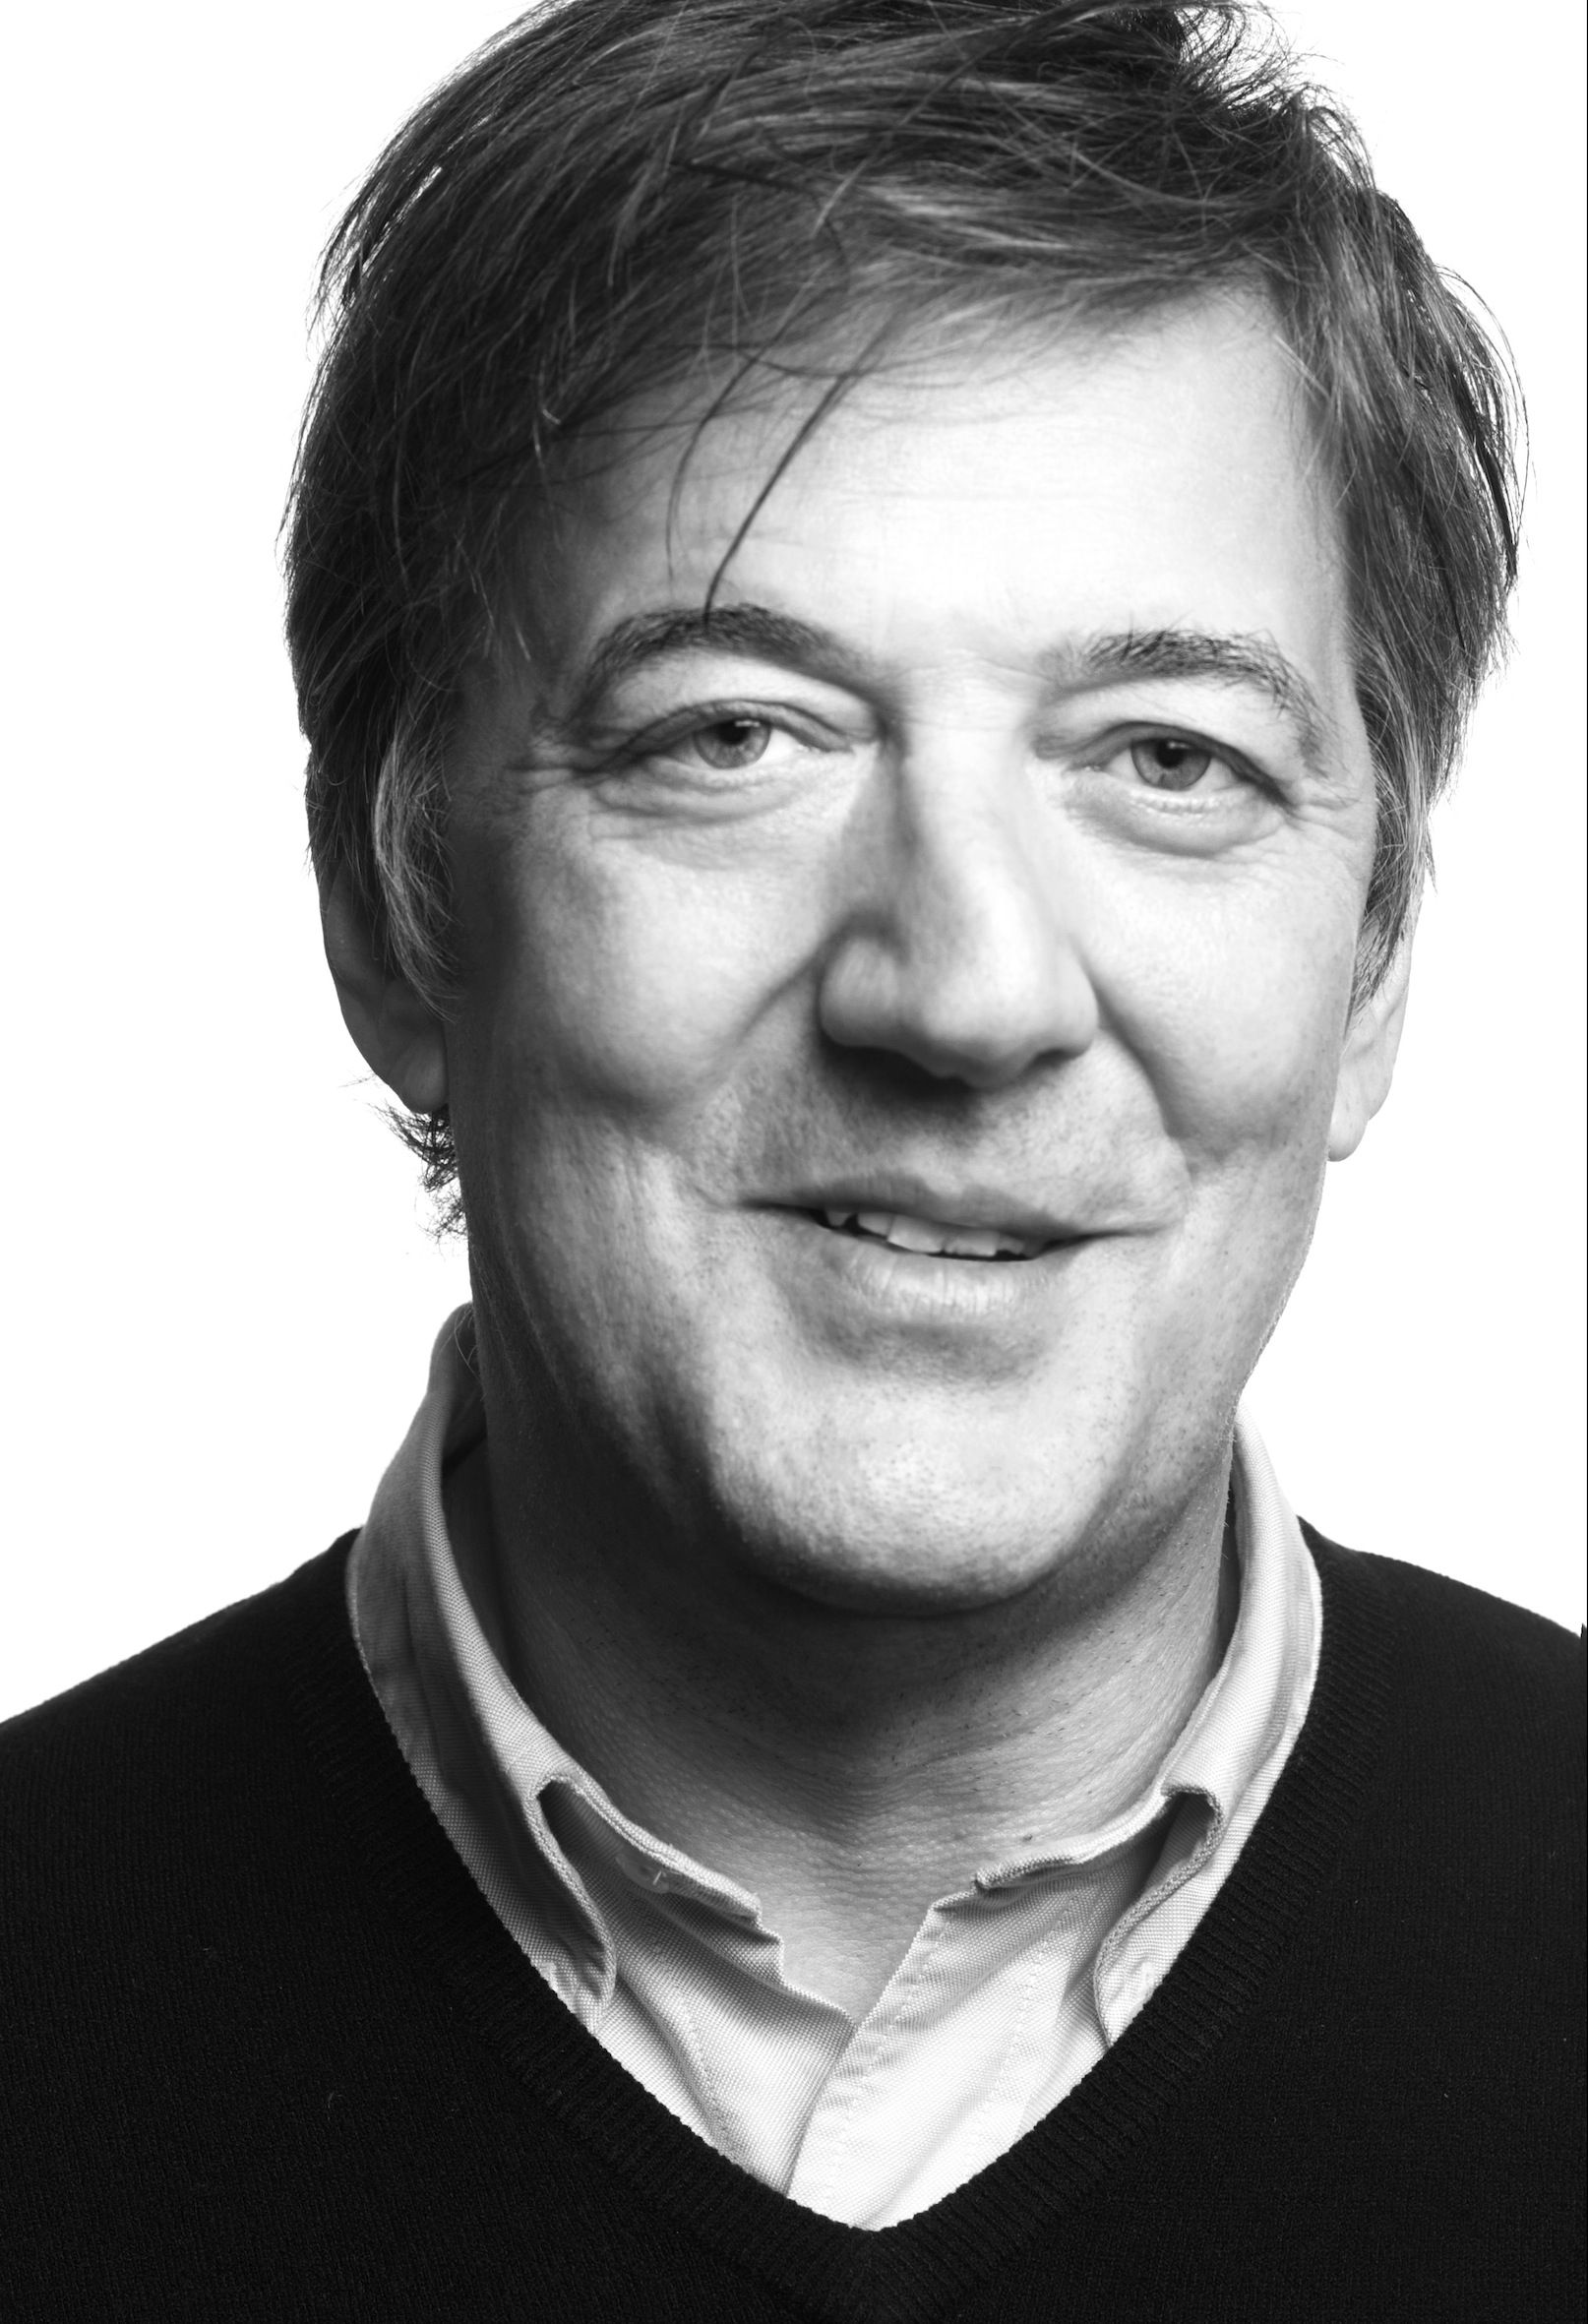 Stephen Fry (born 1957)